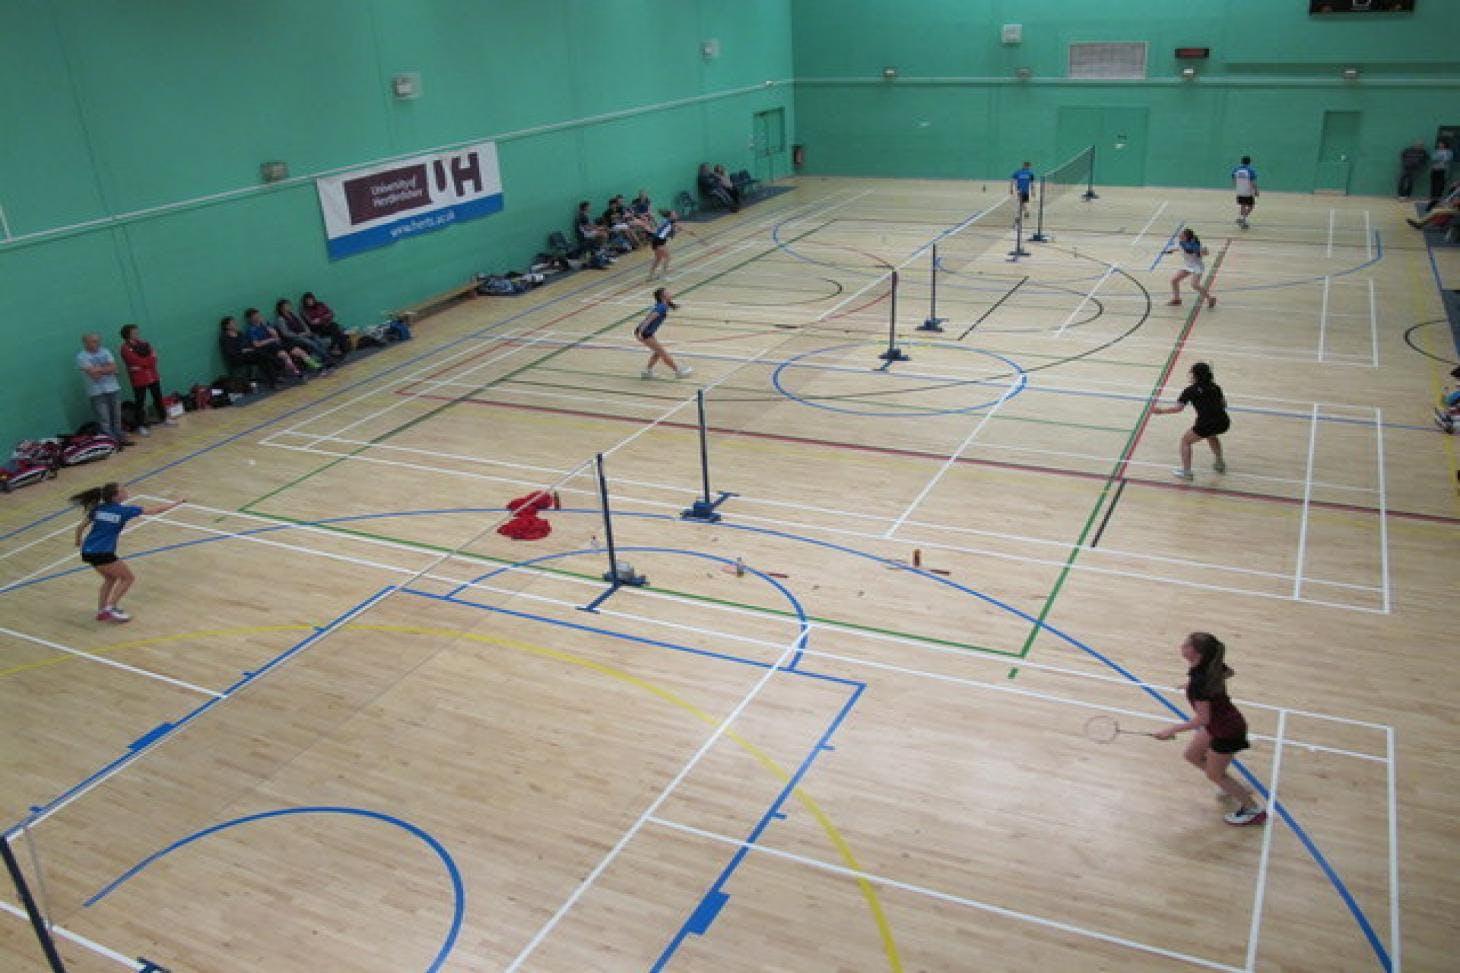 Hertfordshire Sports Village Nets | Sports hall cricket facilities